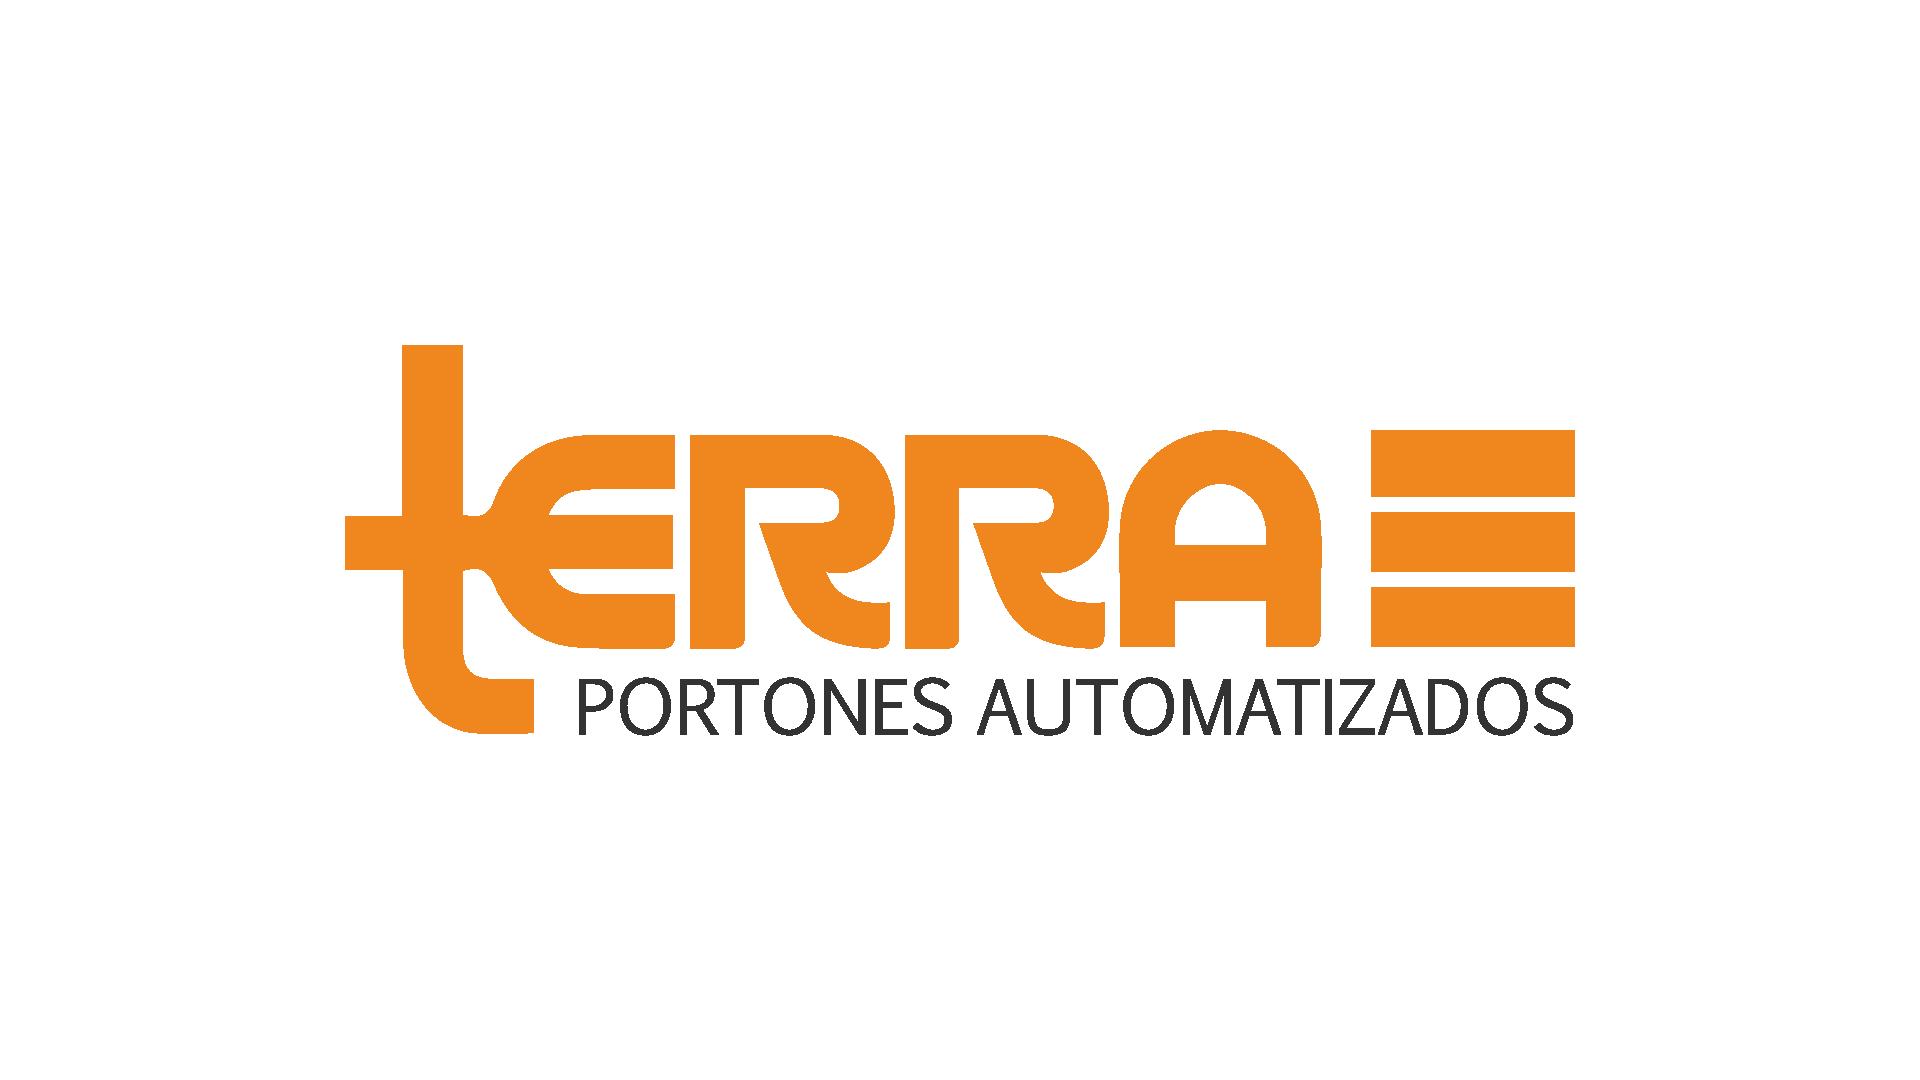 525 Terra portones-01